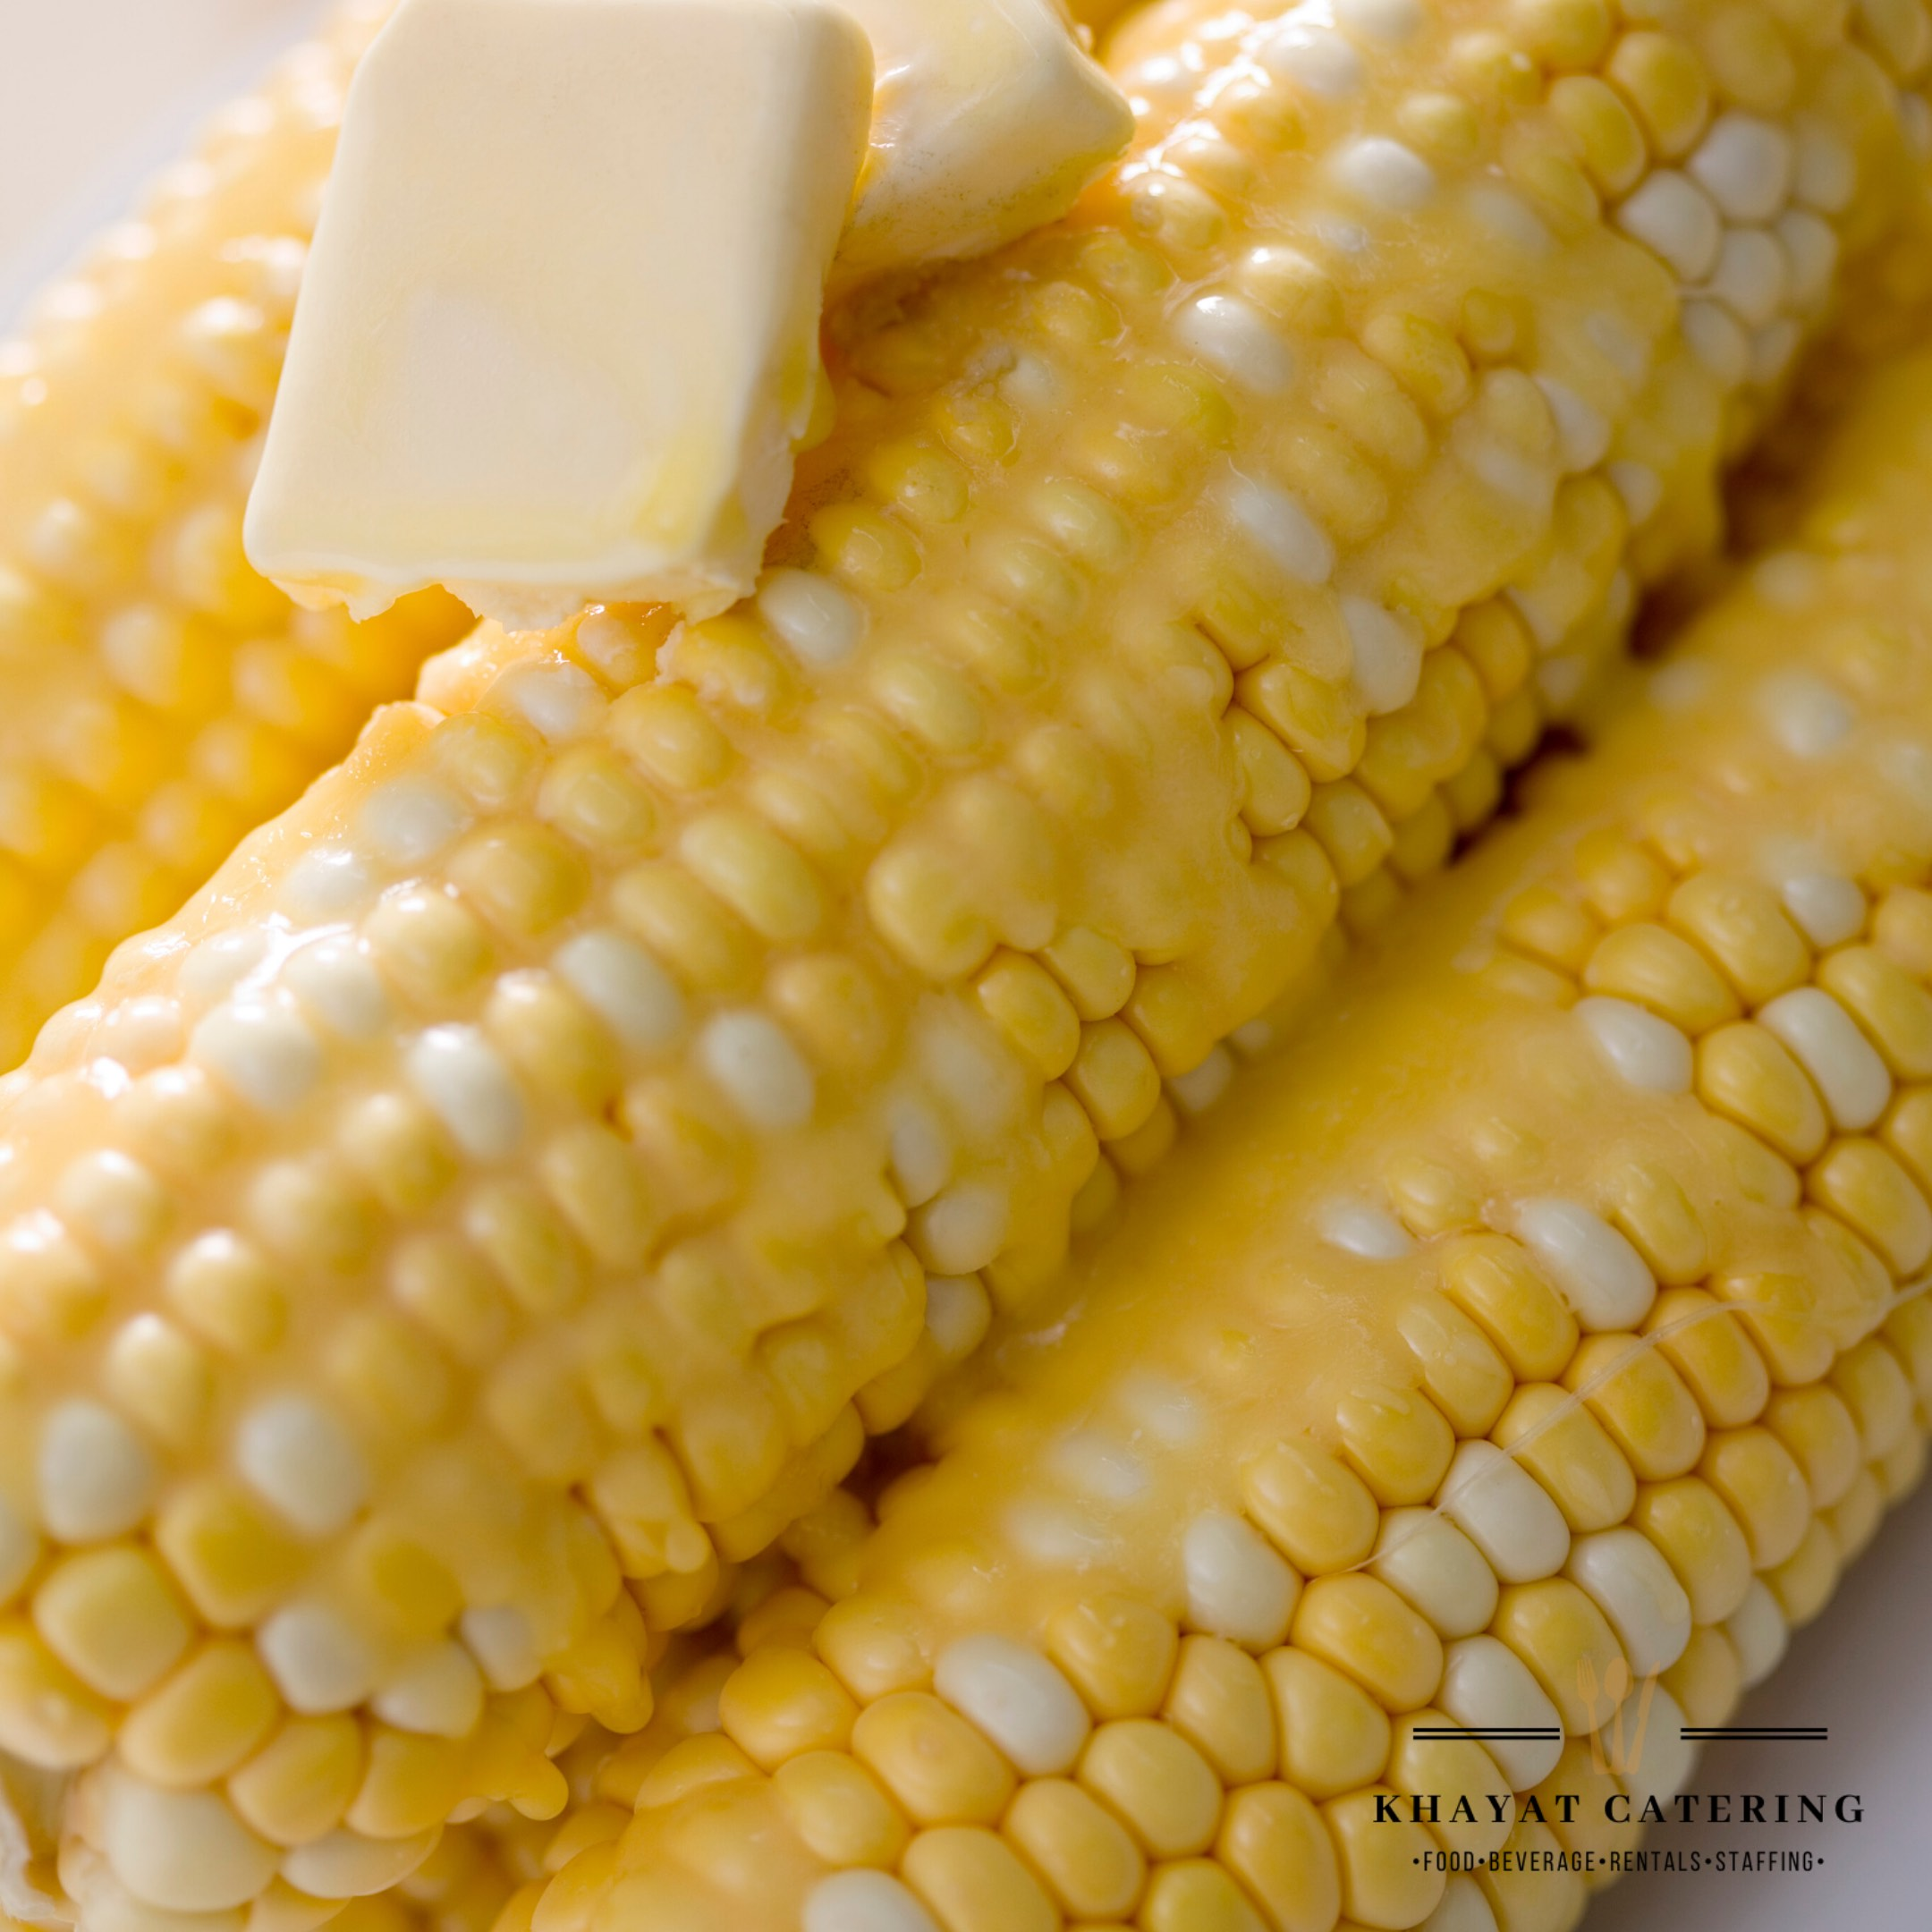 Khayat Catering corn on the cob